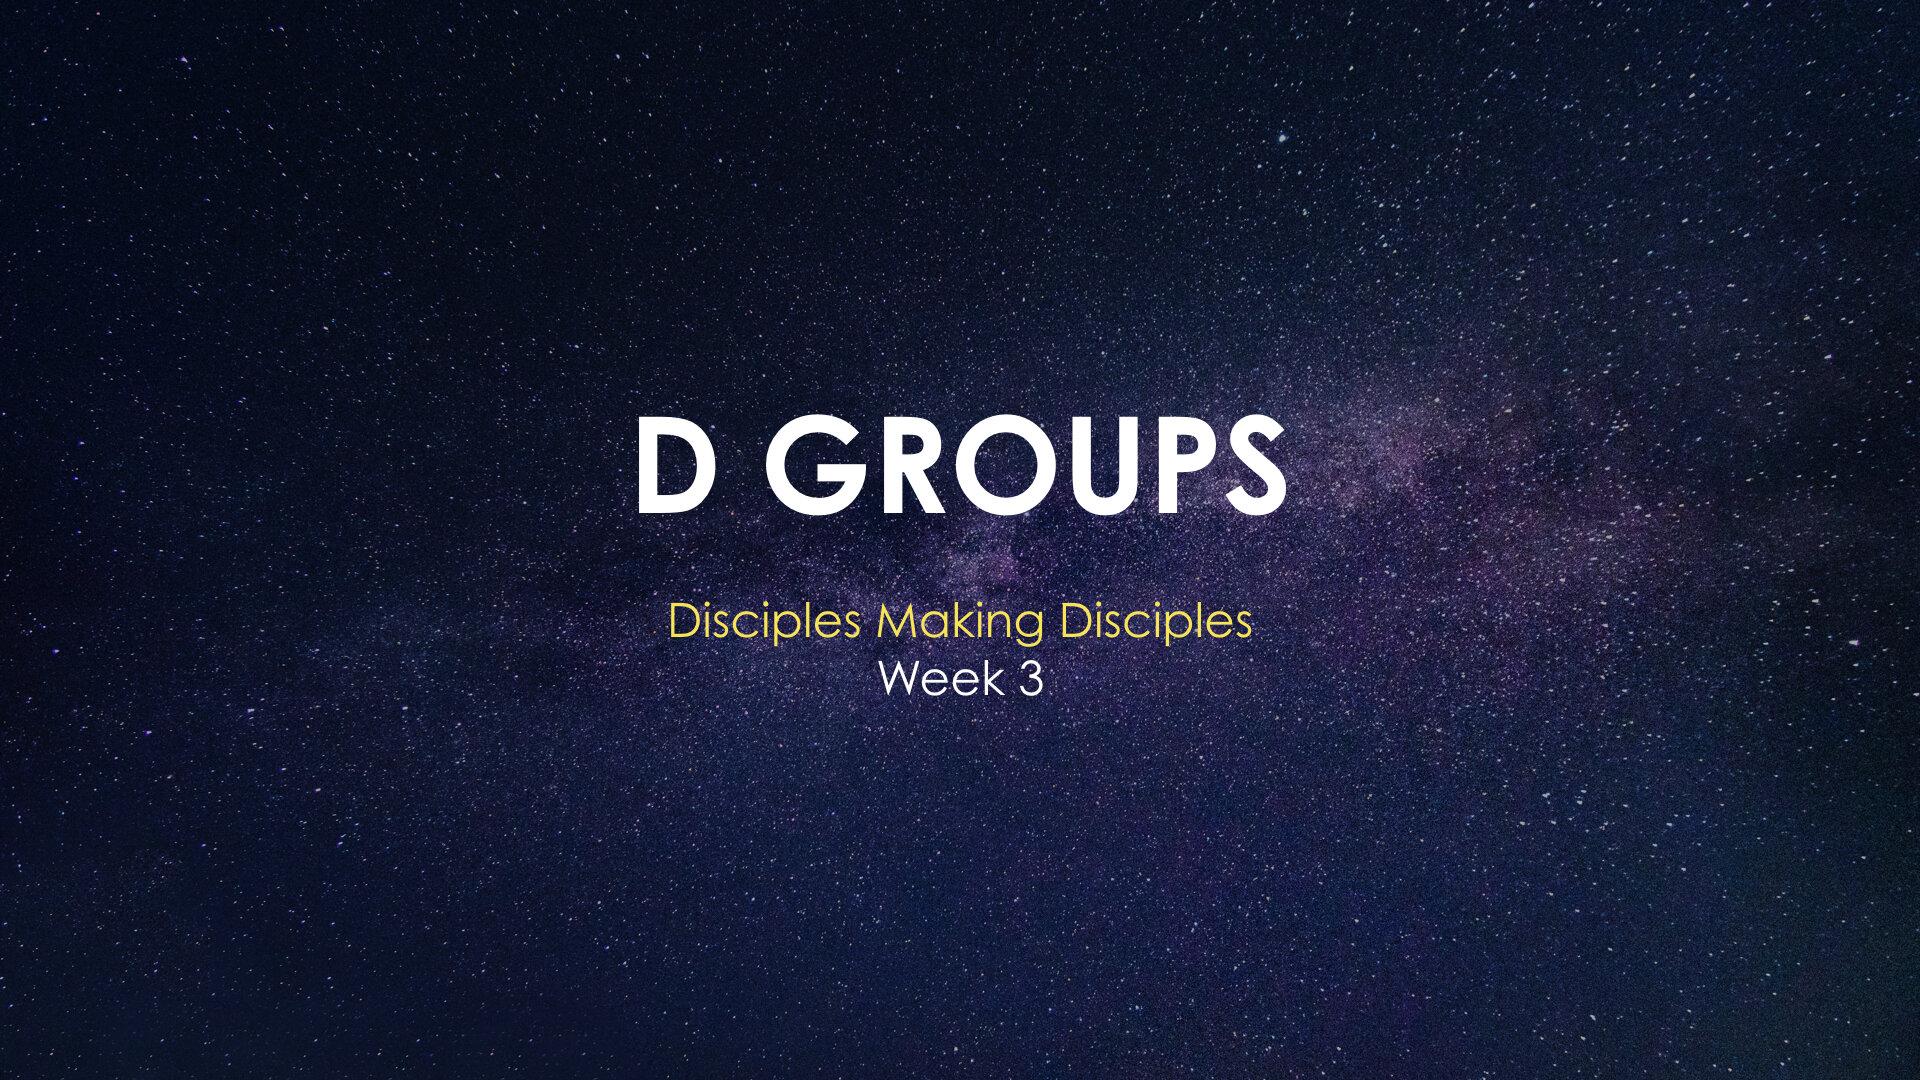 D Group Week 3.001.jpeg